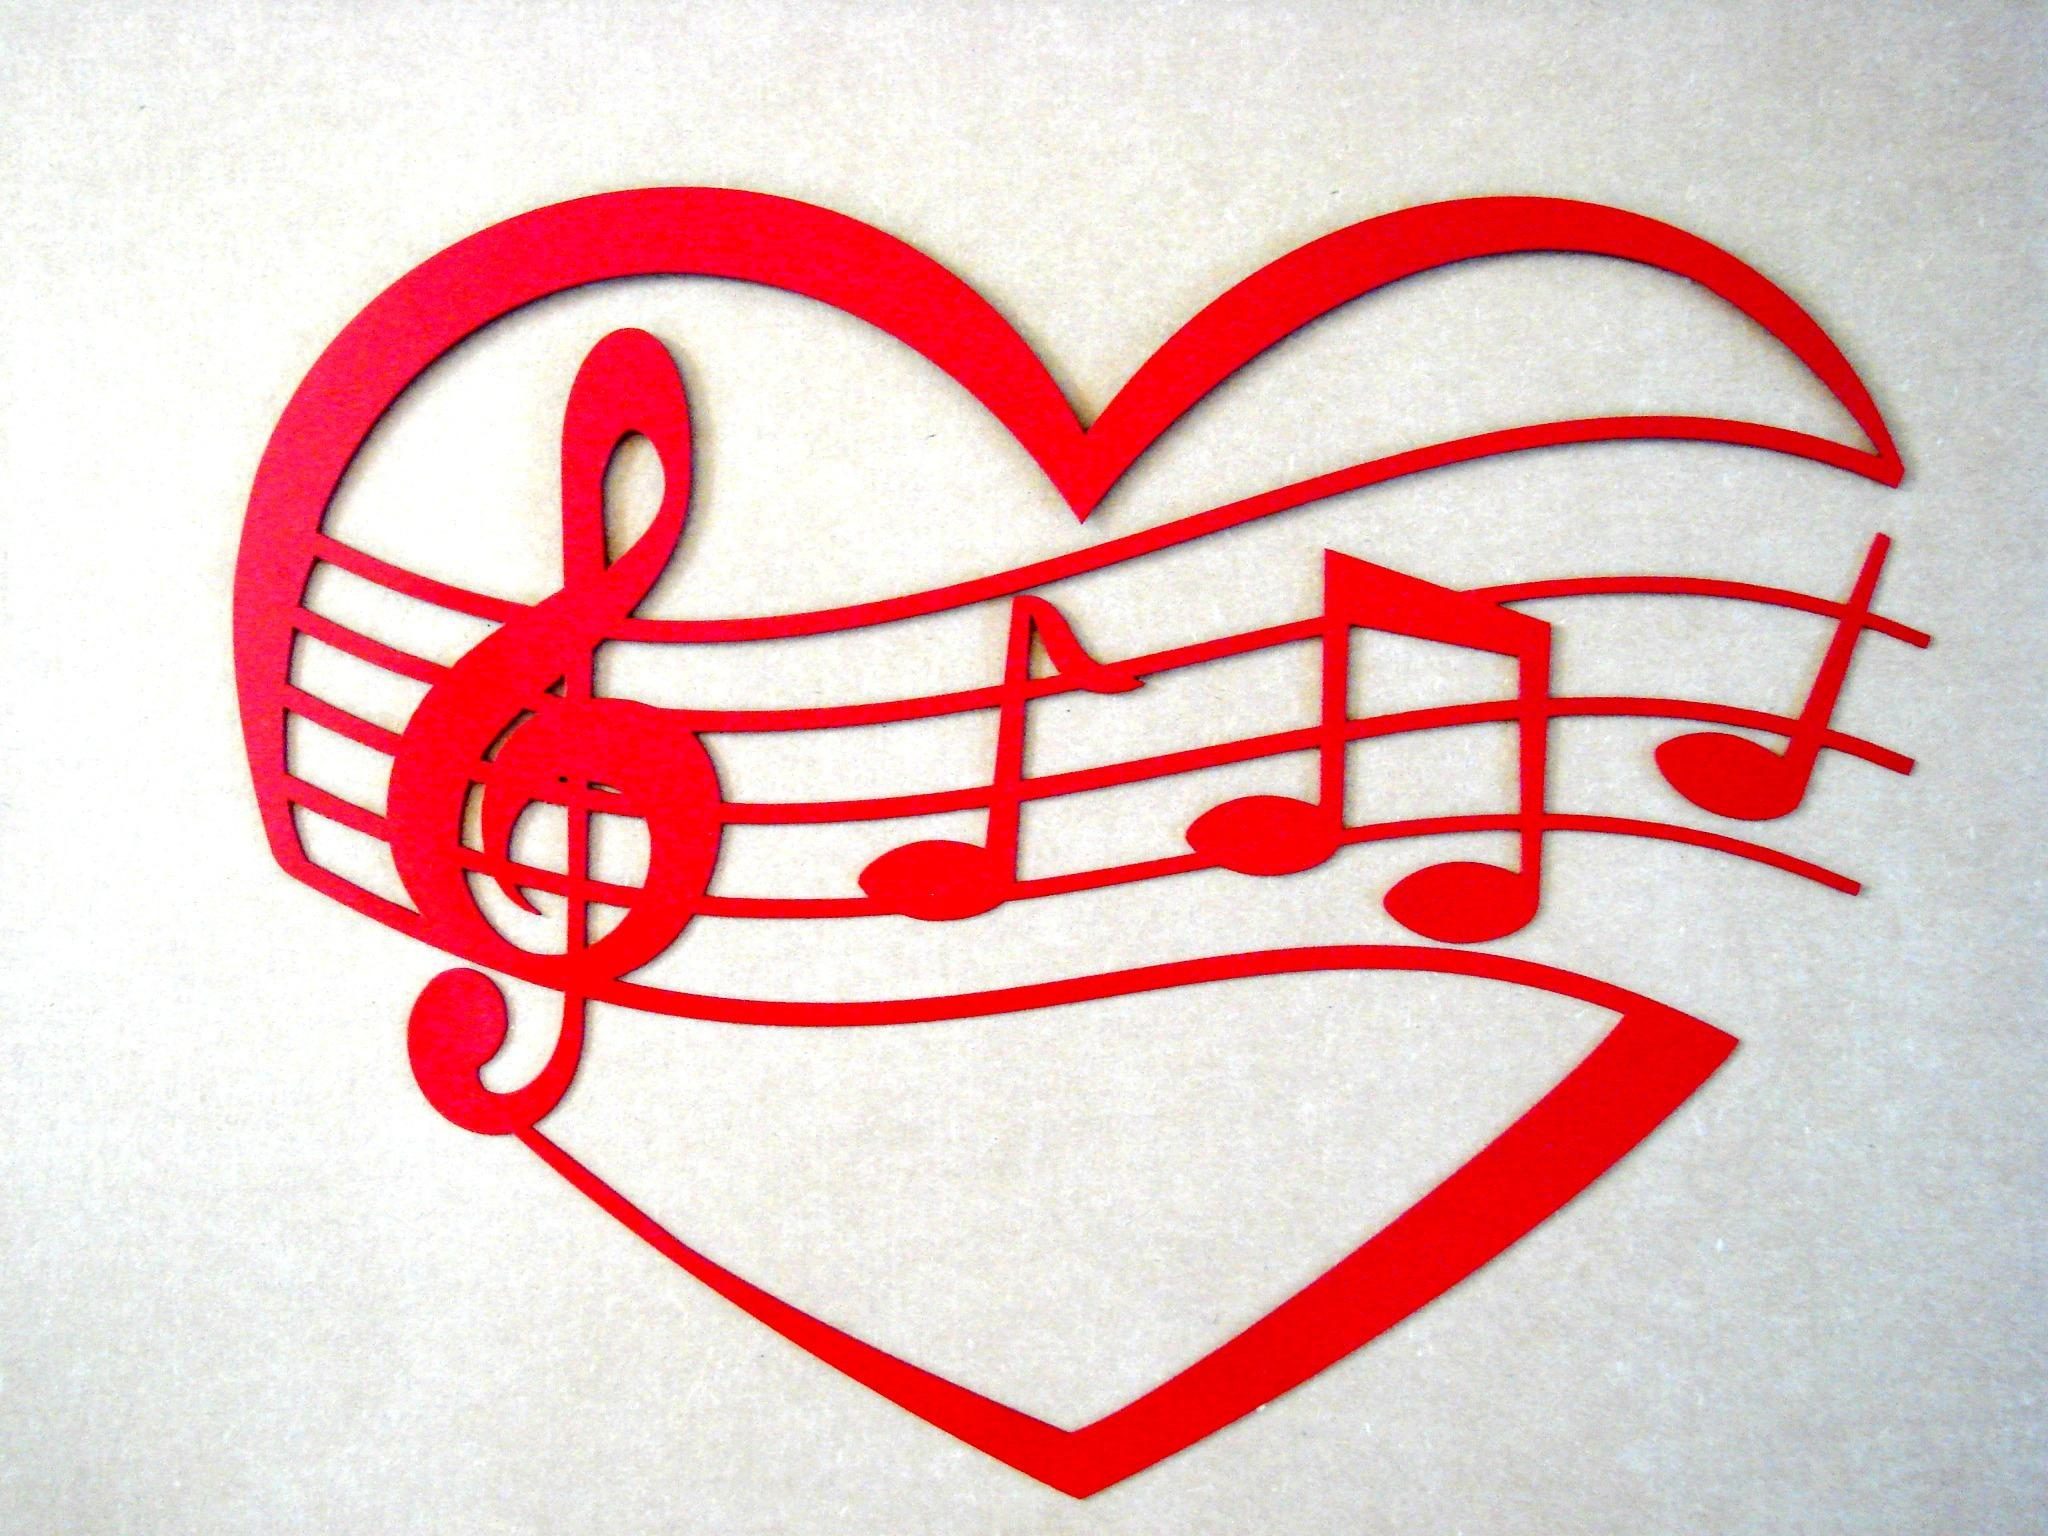 Music Staff (Of My) Heart Shaped Metal Wall Art Sculpture – : Within Heart Shaped Metal Wall Art (Image 9 of 20)